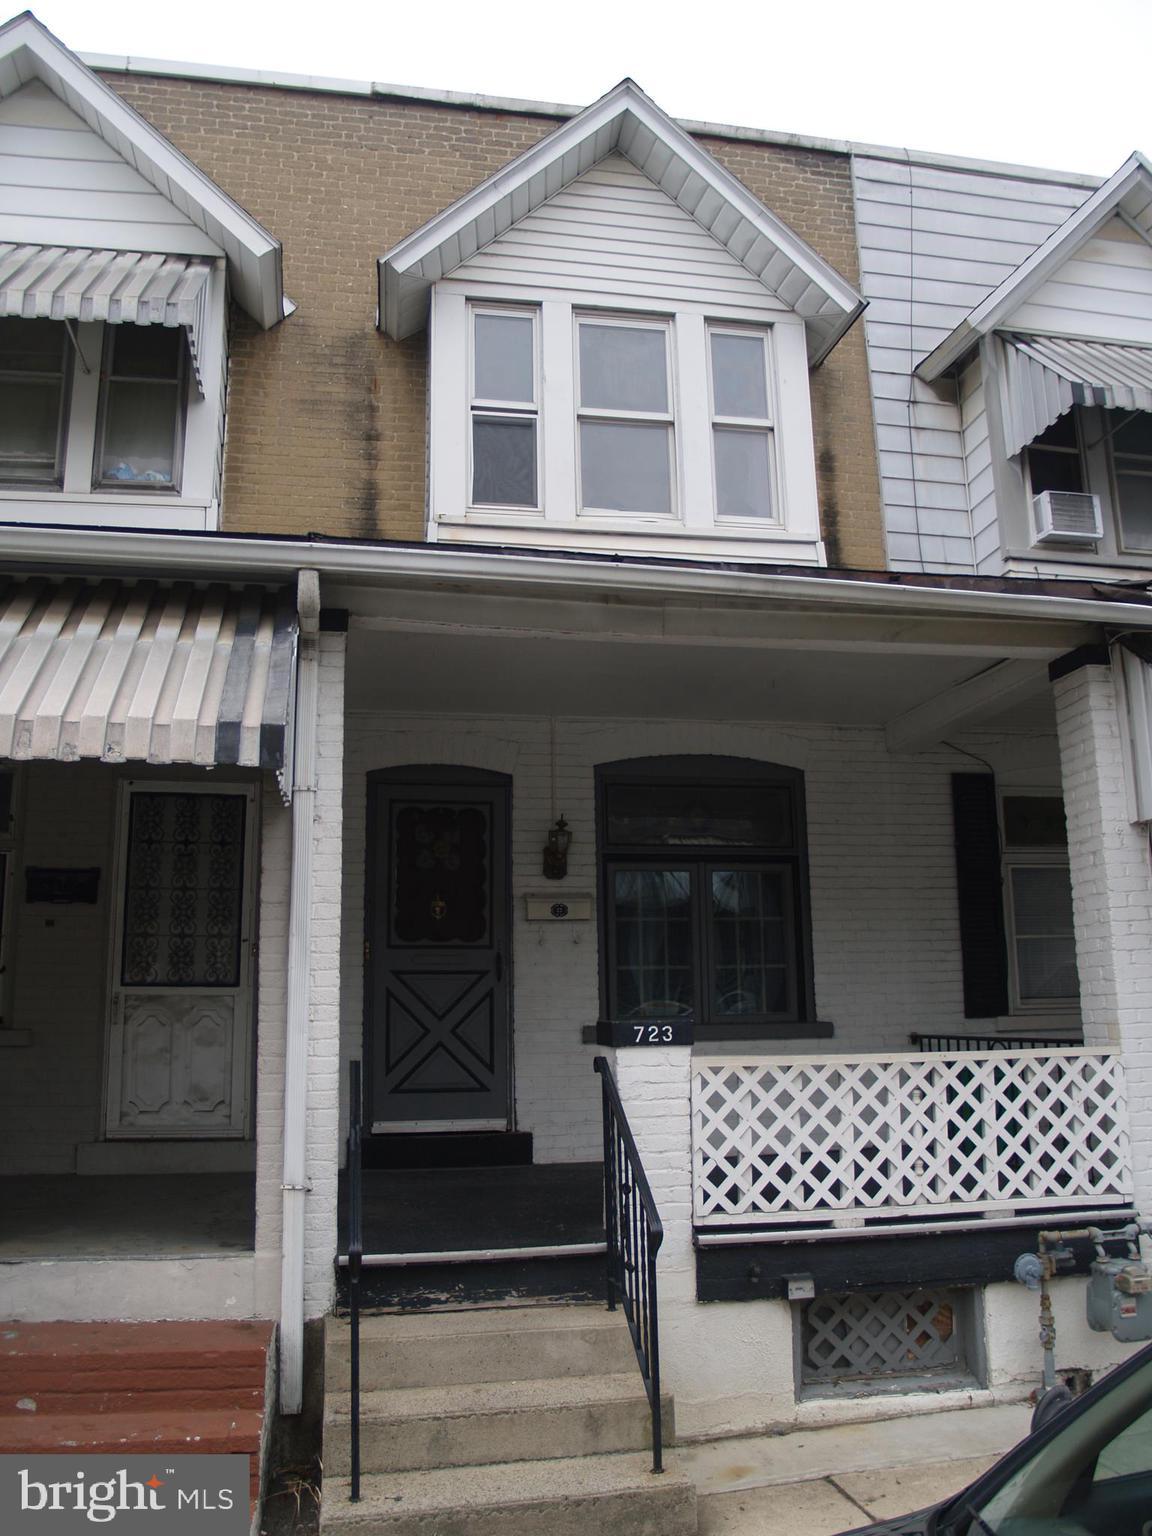 723 W WHITEHALL STREET, ALLENTOWN, PA 18102